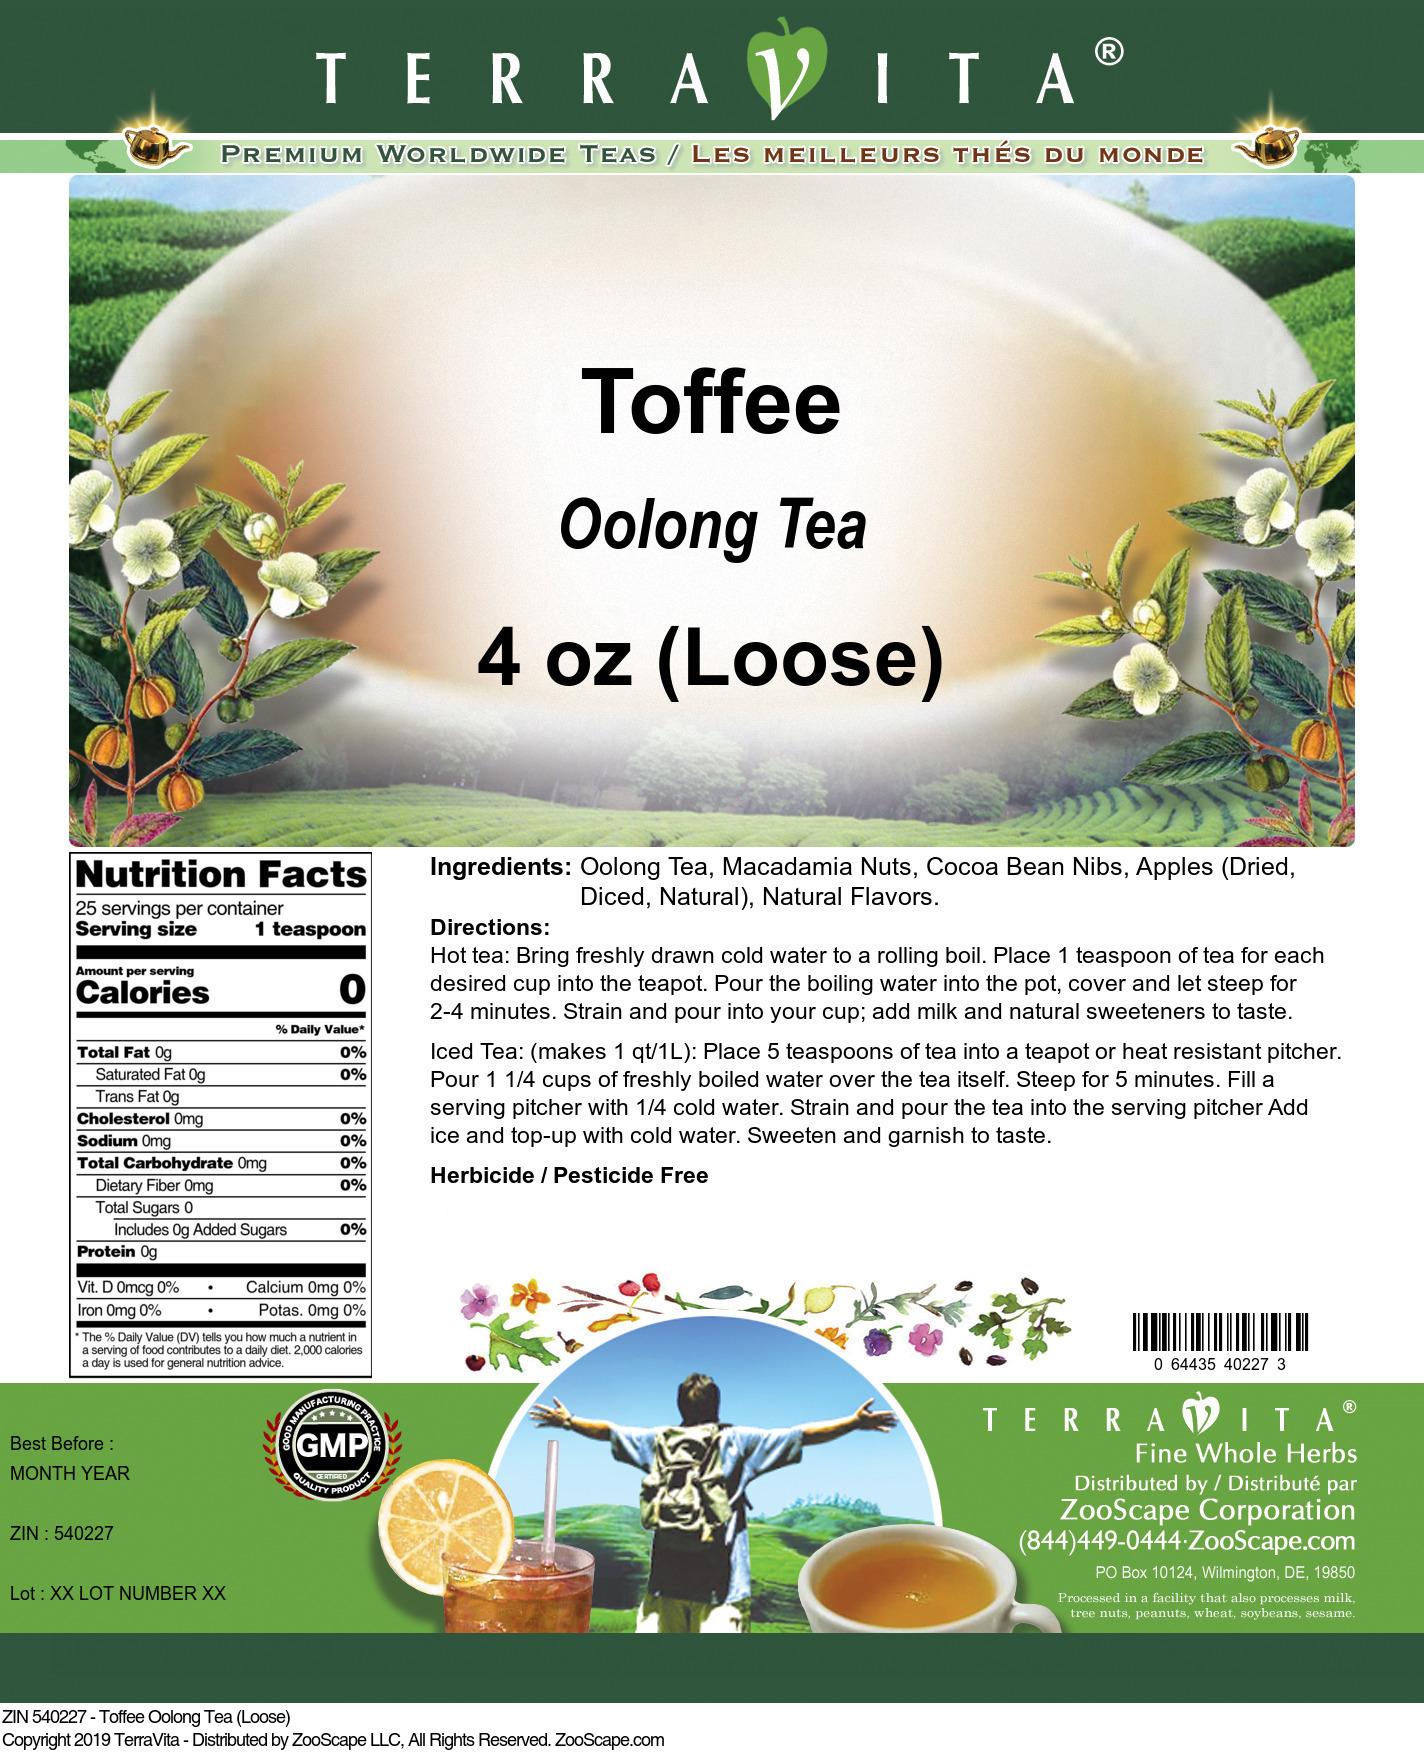 Toffee Oolong Tea